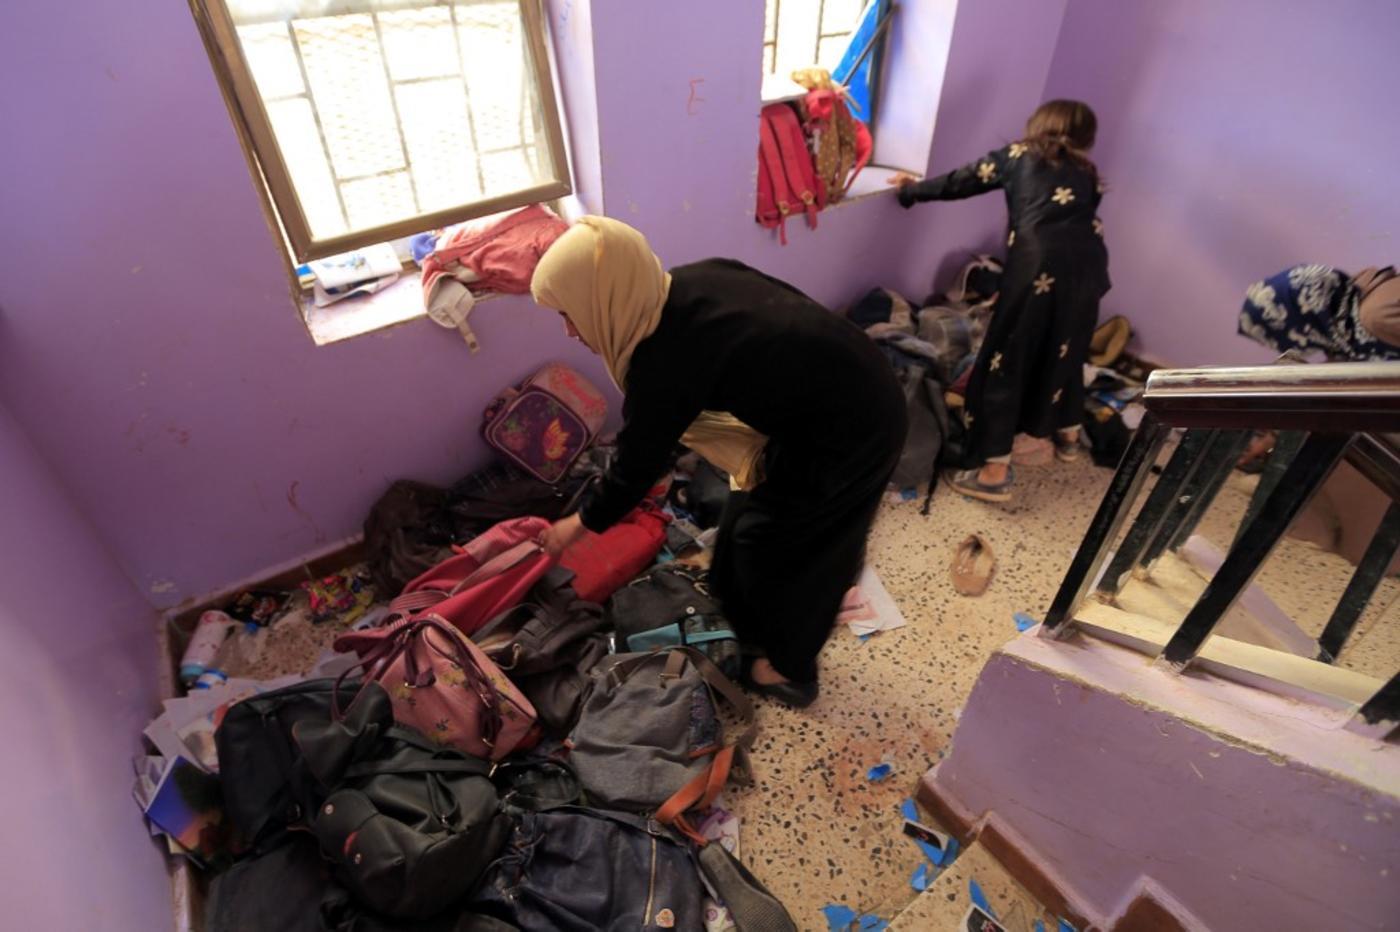 Yemen: Houthi warehouse explosion killed 15 children, say rights